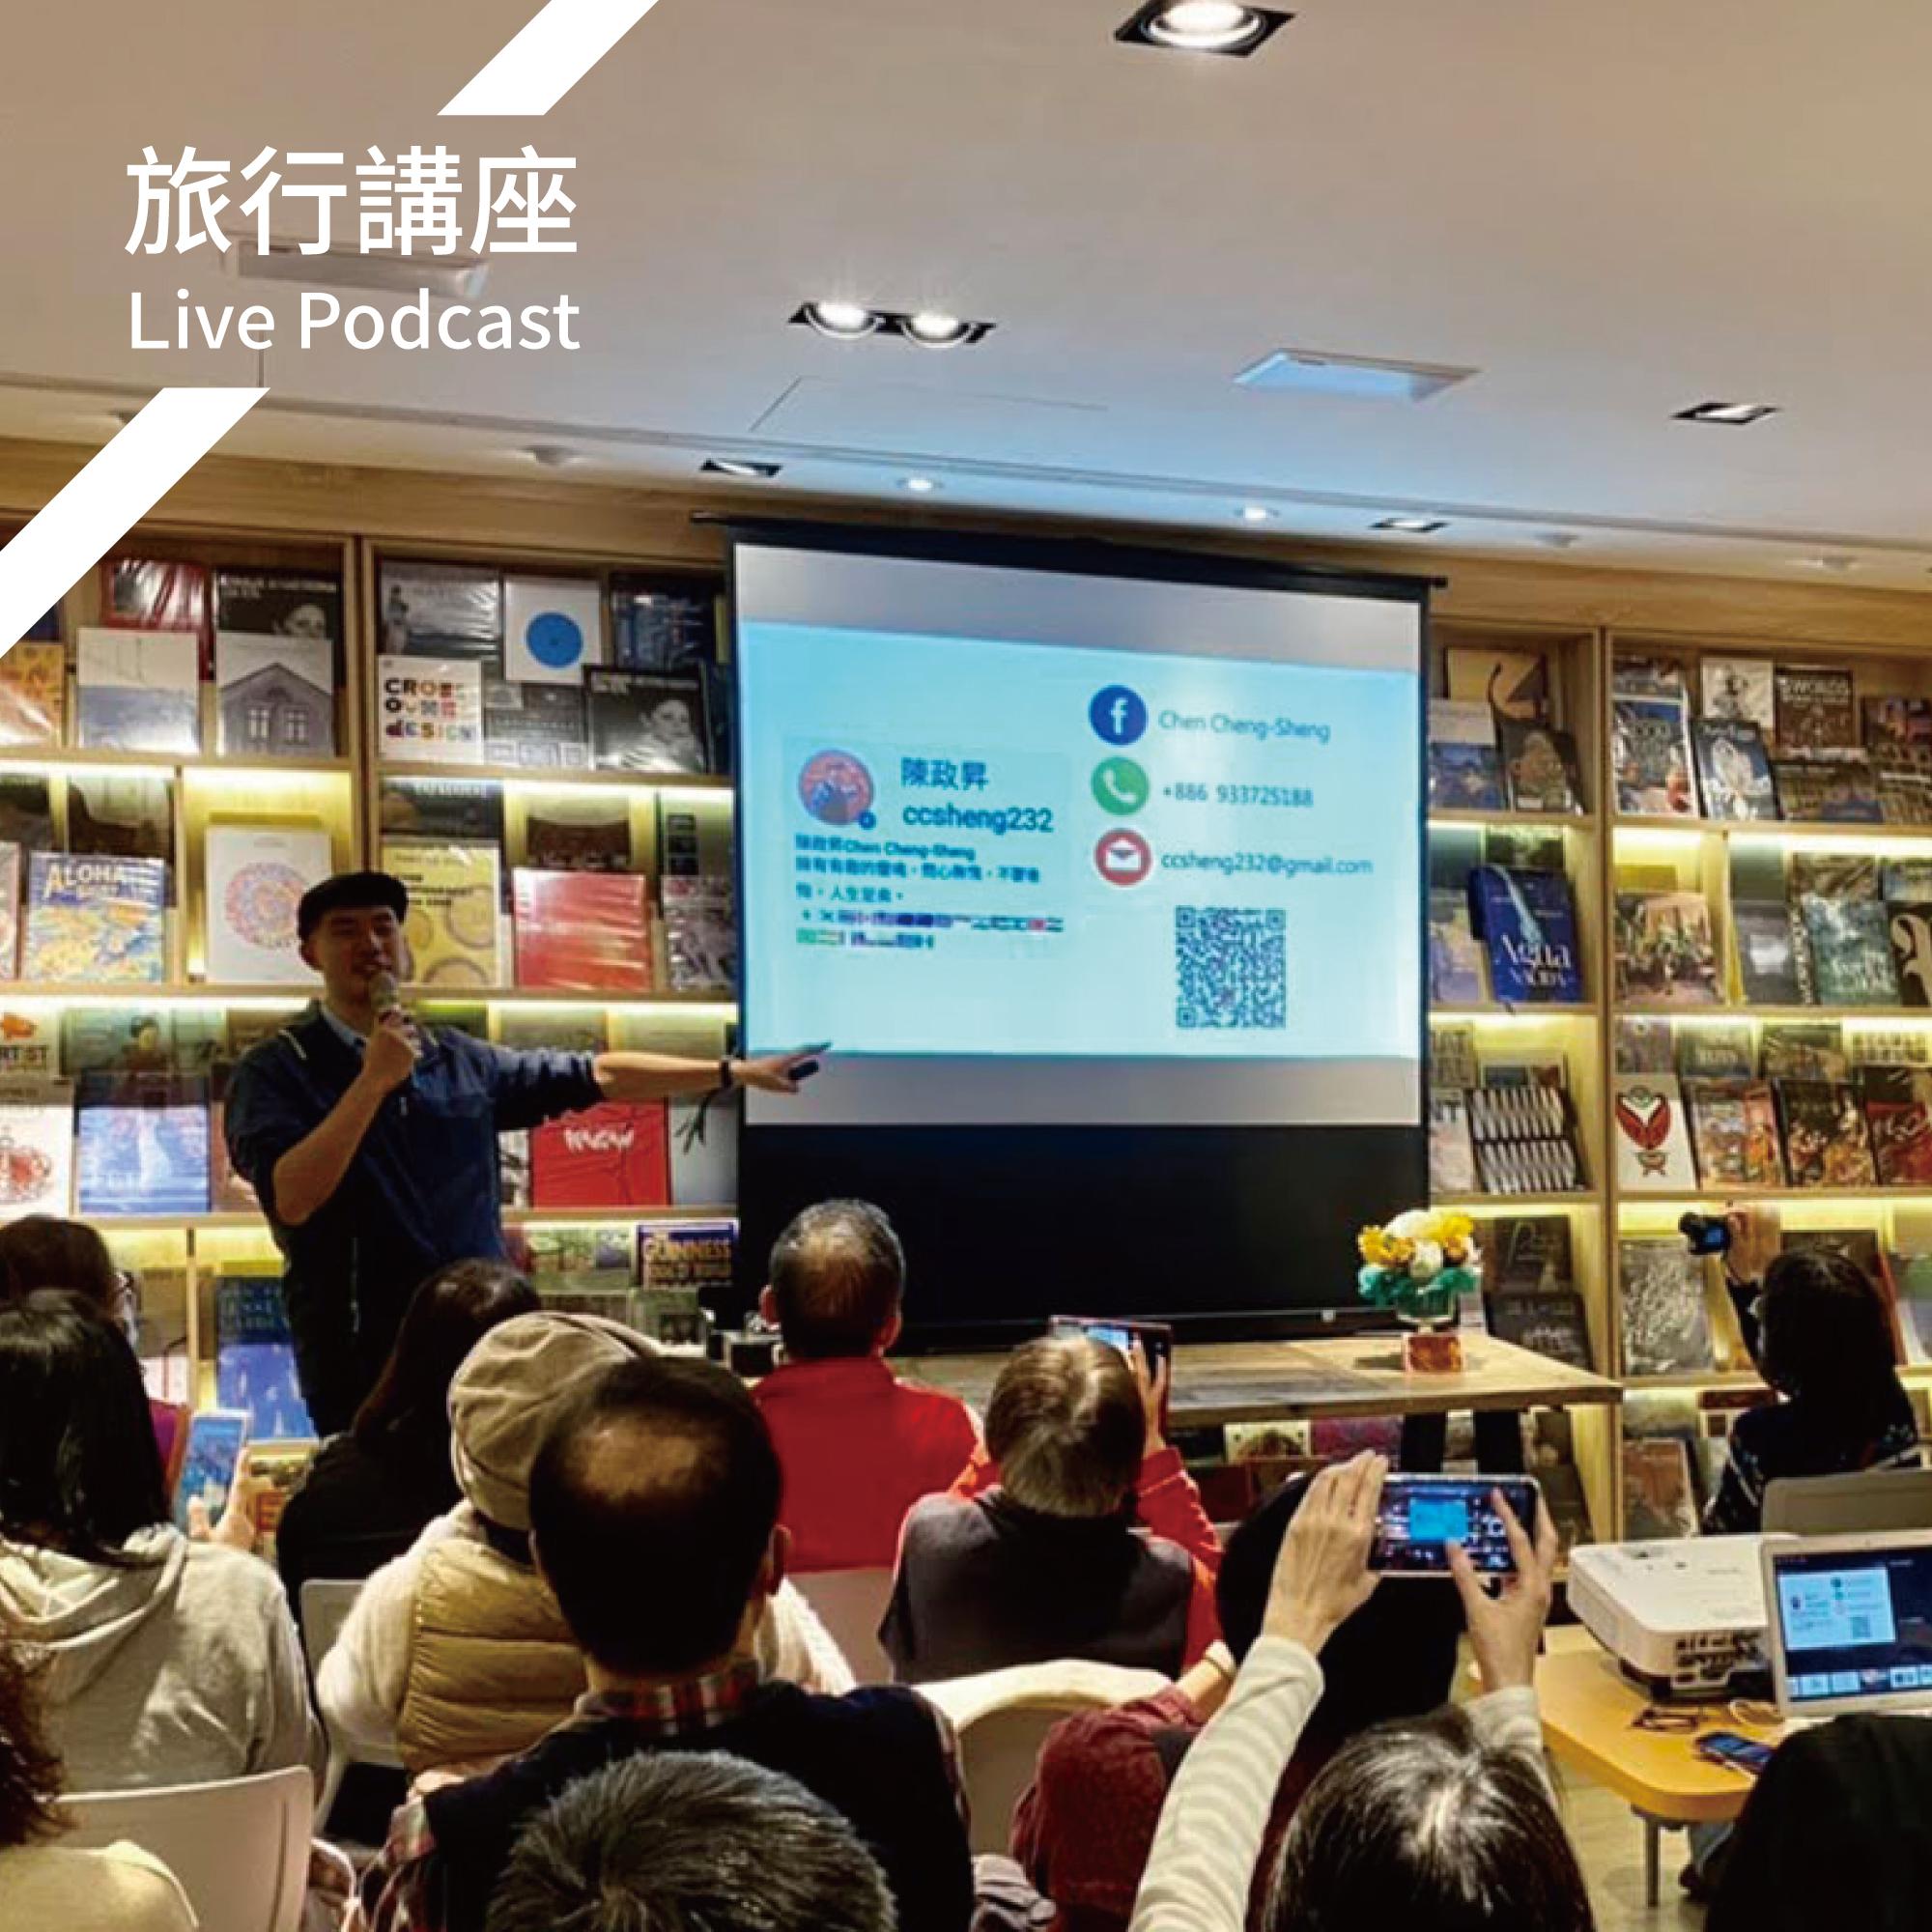 EP91 現場錄音✈達叔旅行講座Live Podcast┃環遊世界,旅行,人生故事